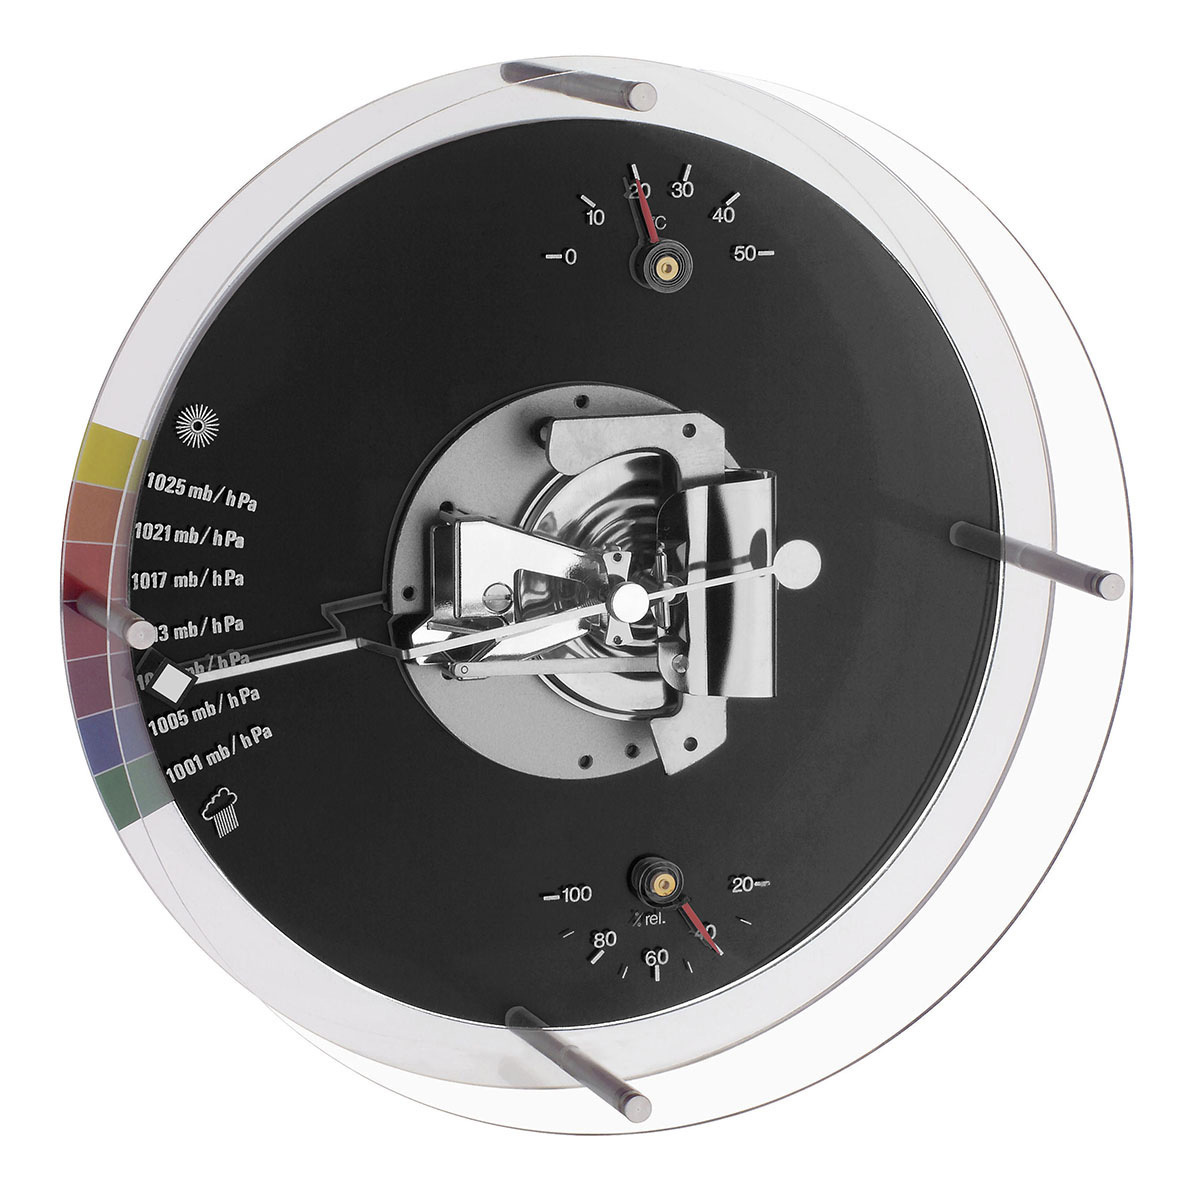 20-2049b-analoge-design-wetterstation-cosmo-1200x1200px.jpg